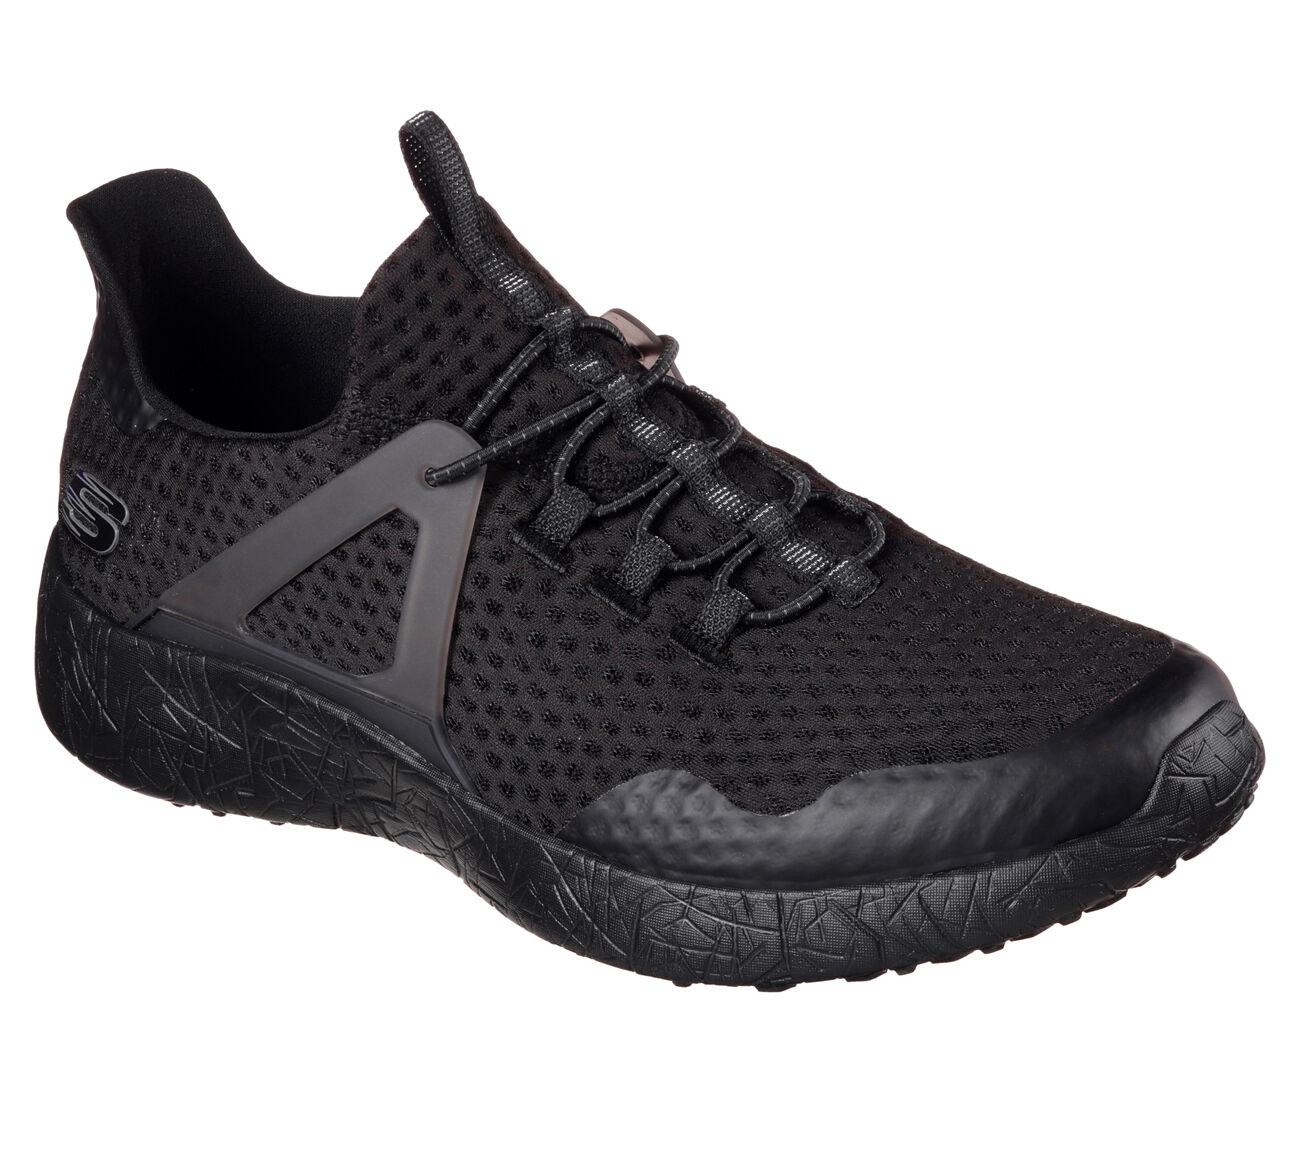 5c02485376b8 Skechers Burst Shinz Trainers Mens Fashion Sports Memory Foam Mesh Knit  Shoes